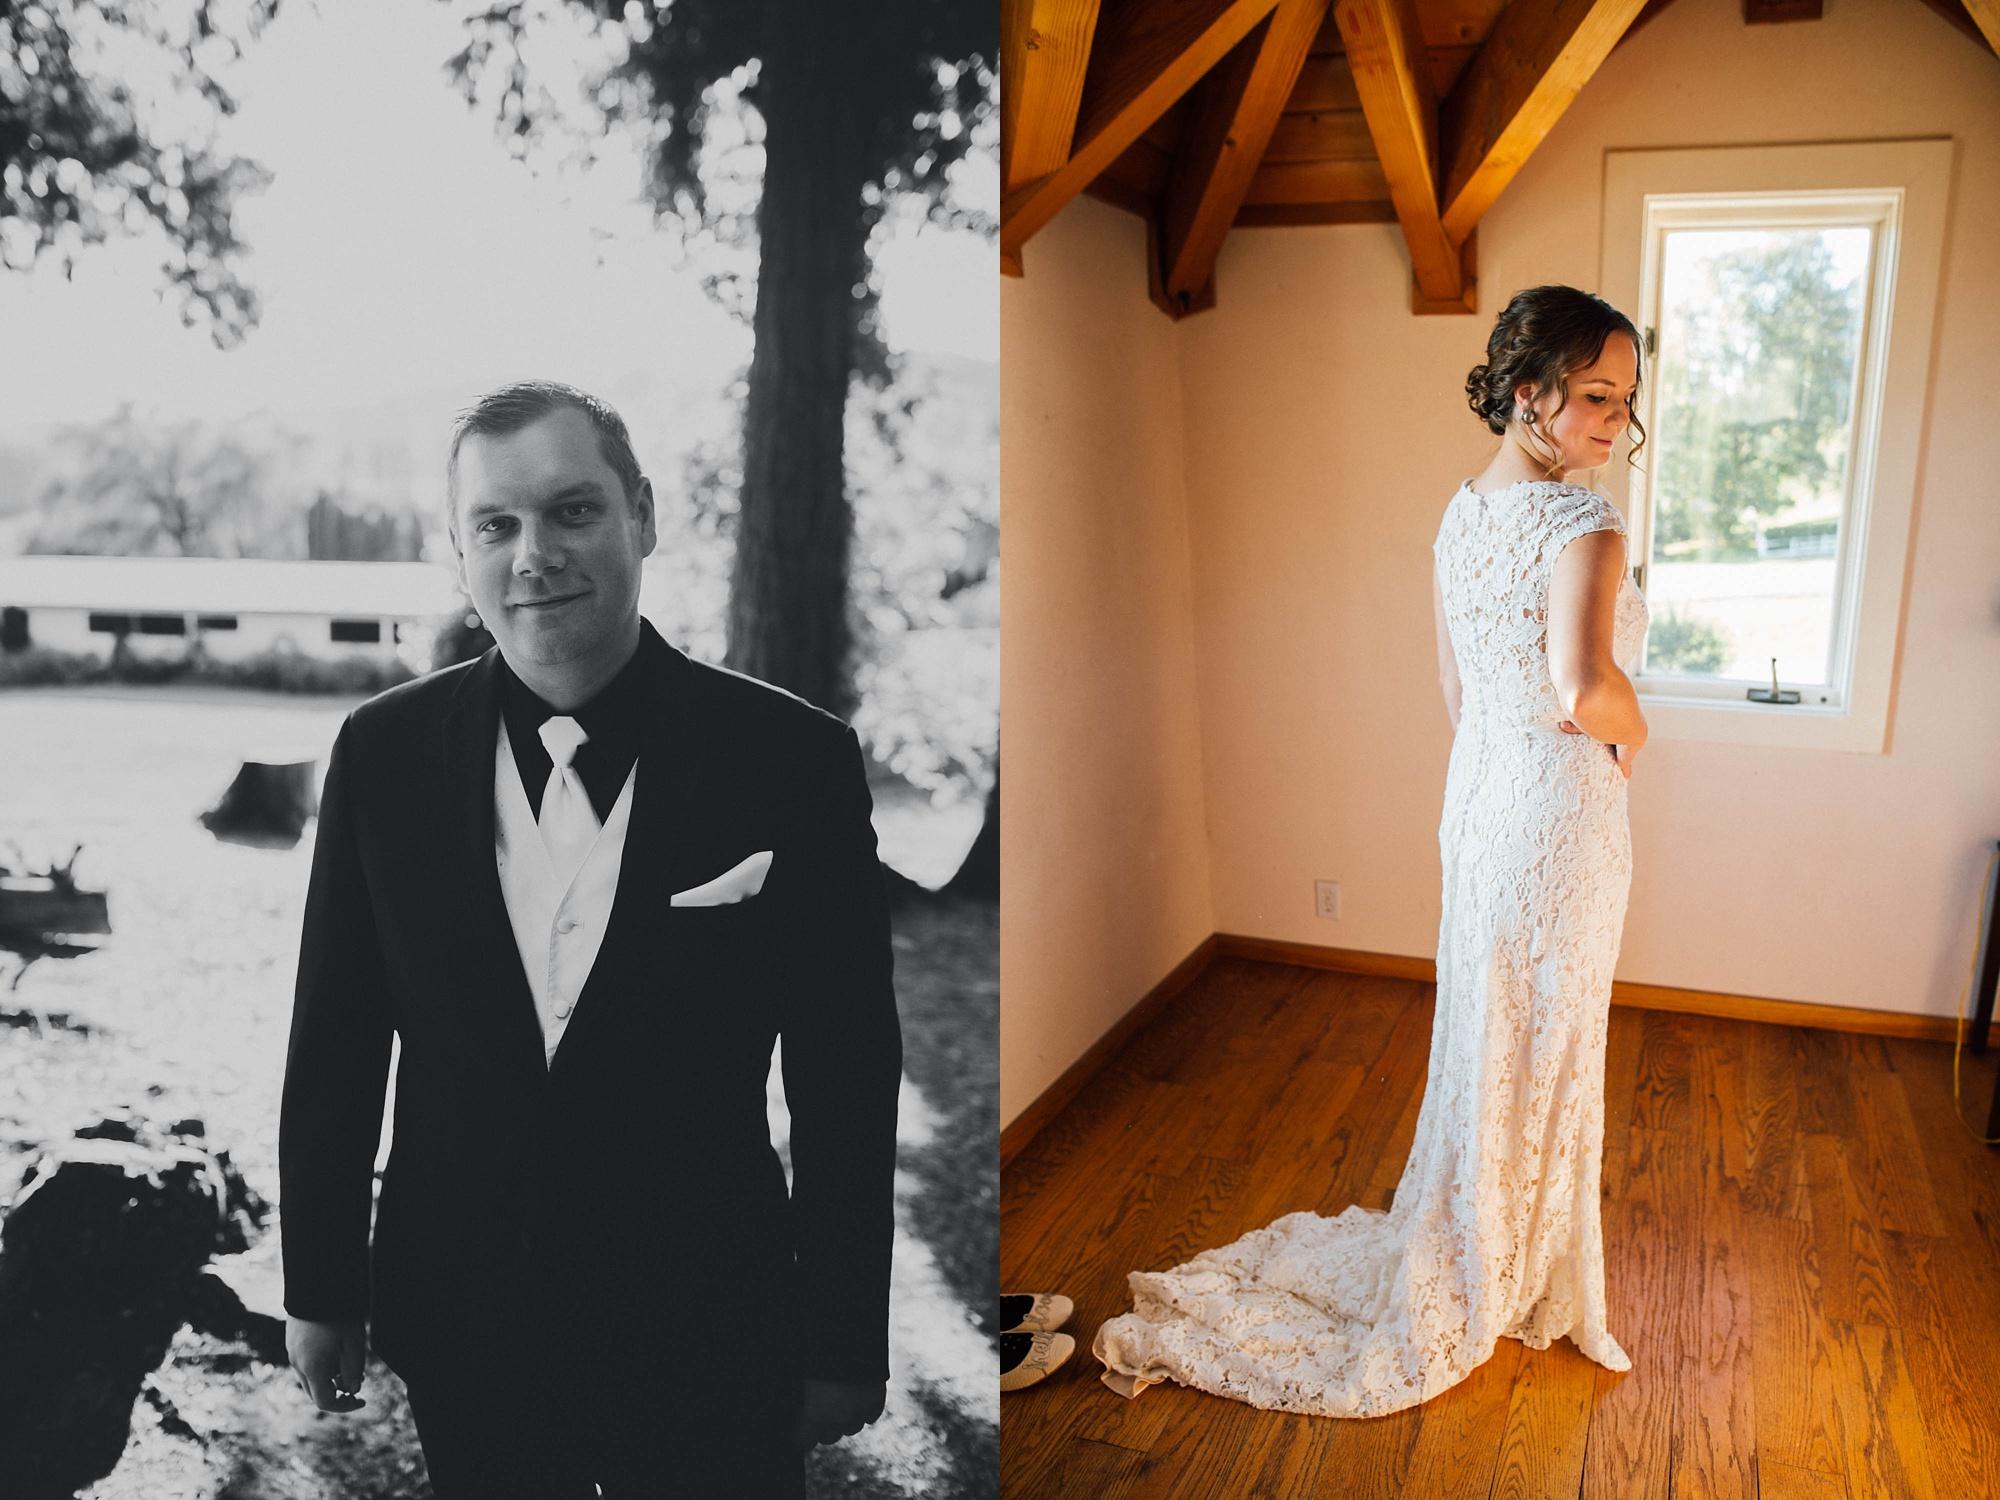 ashley_vos_seattle_ wedding_photographer_0189.jpg